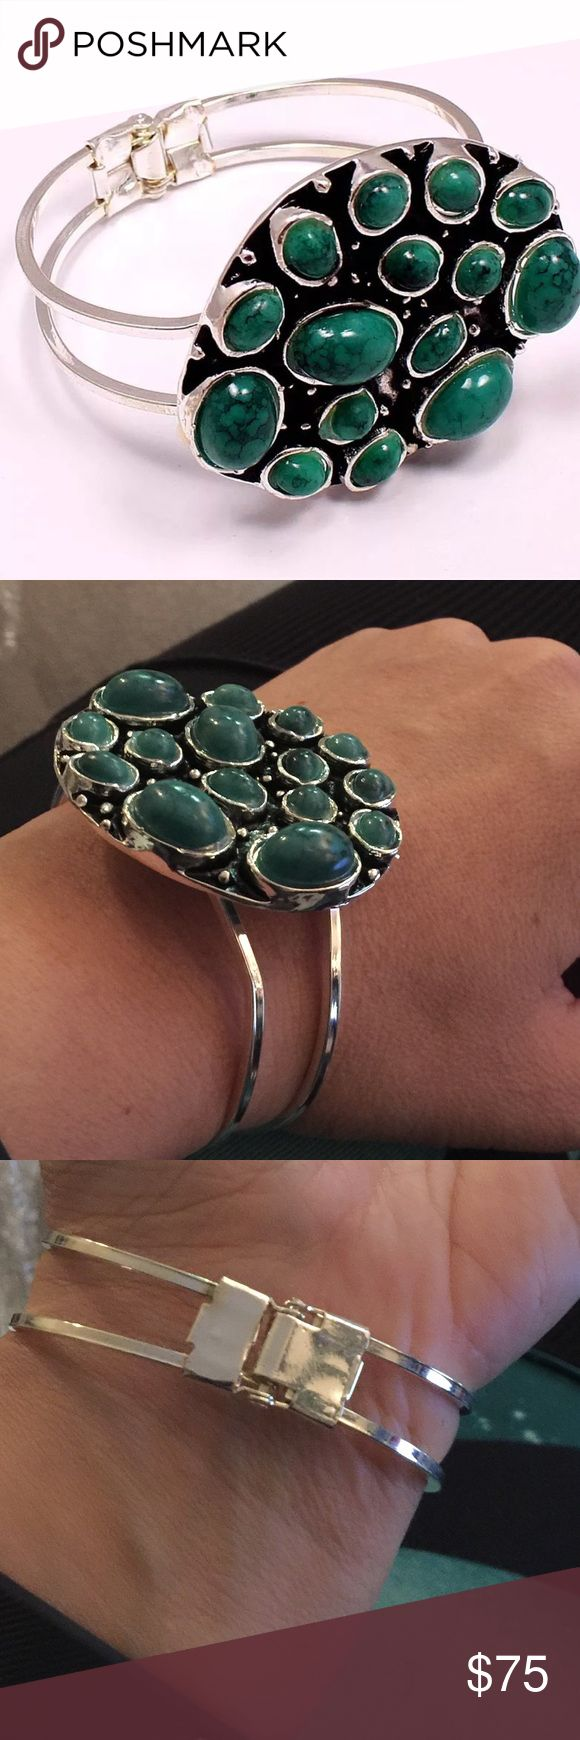 Sterling plated statement bracelet NWT green Silver plated green turquoise hinged bracelet NWT Violette Studios Jewelry Bracelets